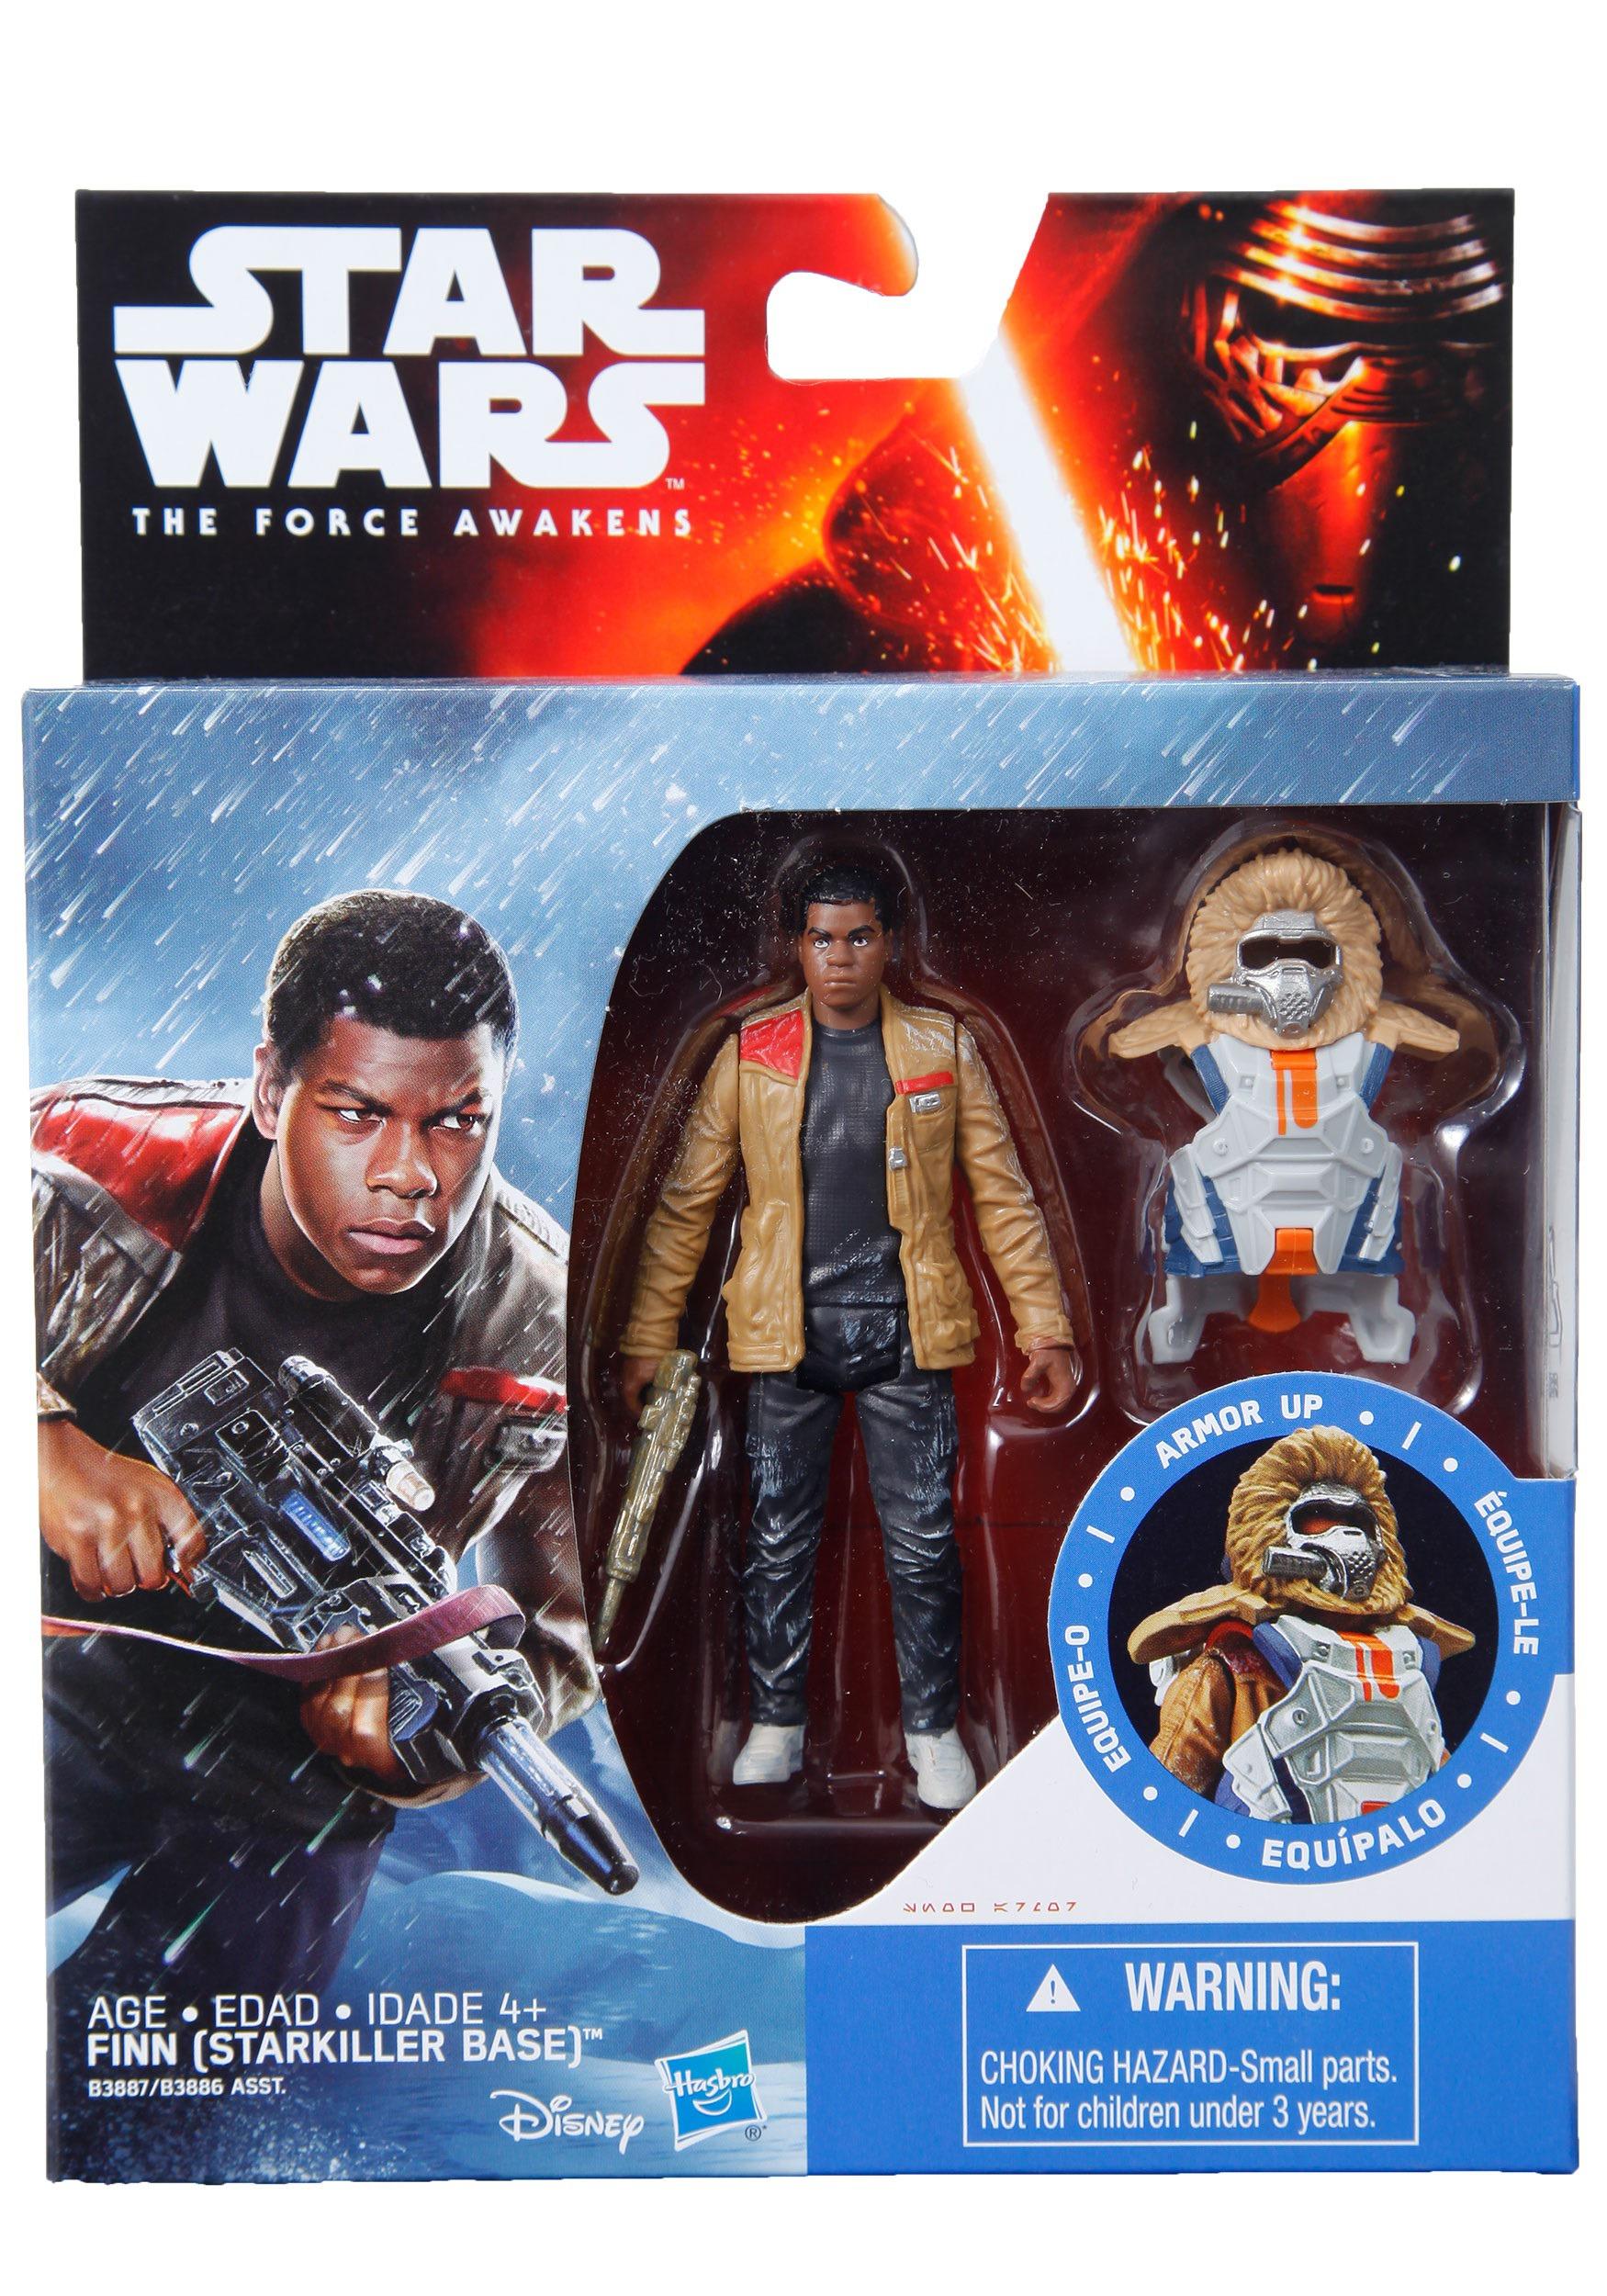 "Star Wars The Force Awakens Finn (Starkiller Base) 3.75"" Figure EEDB3887"